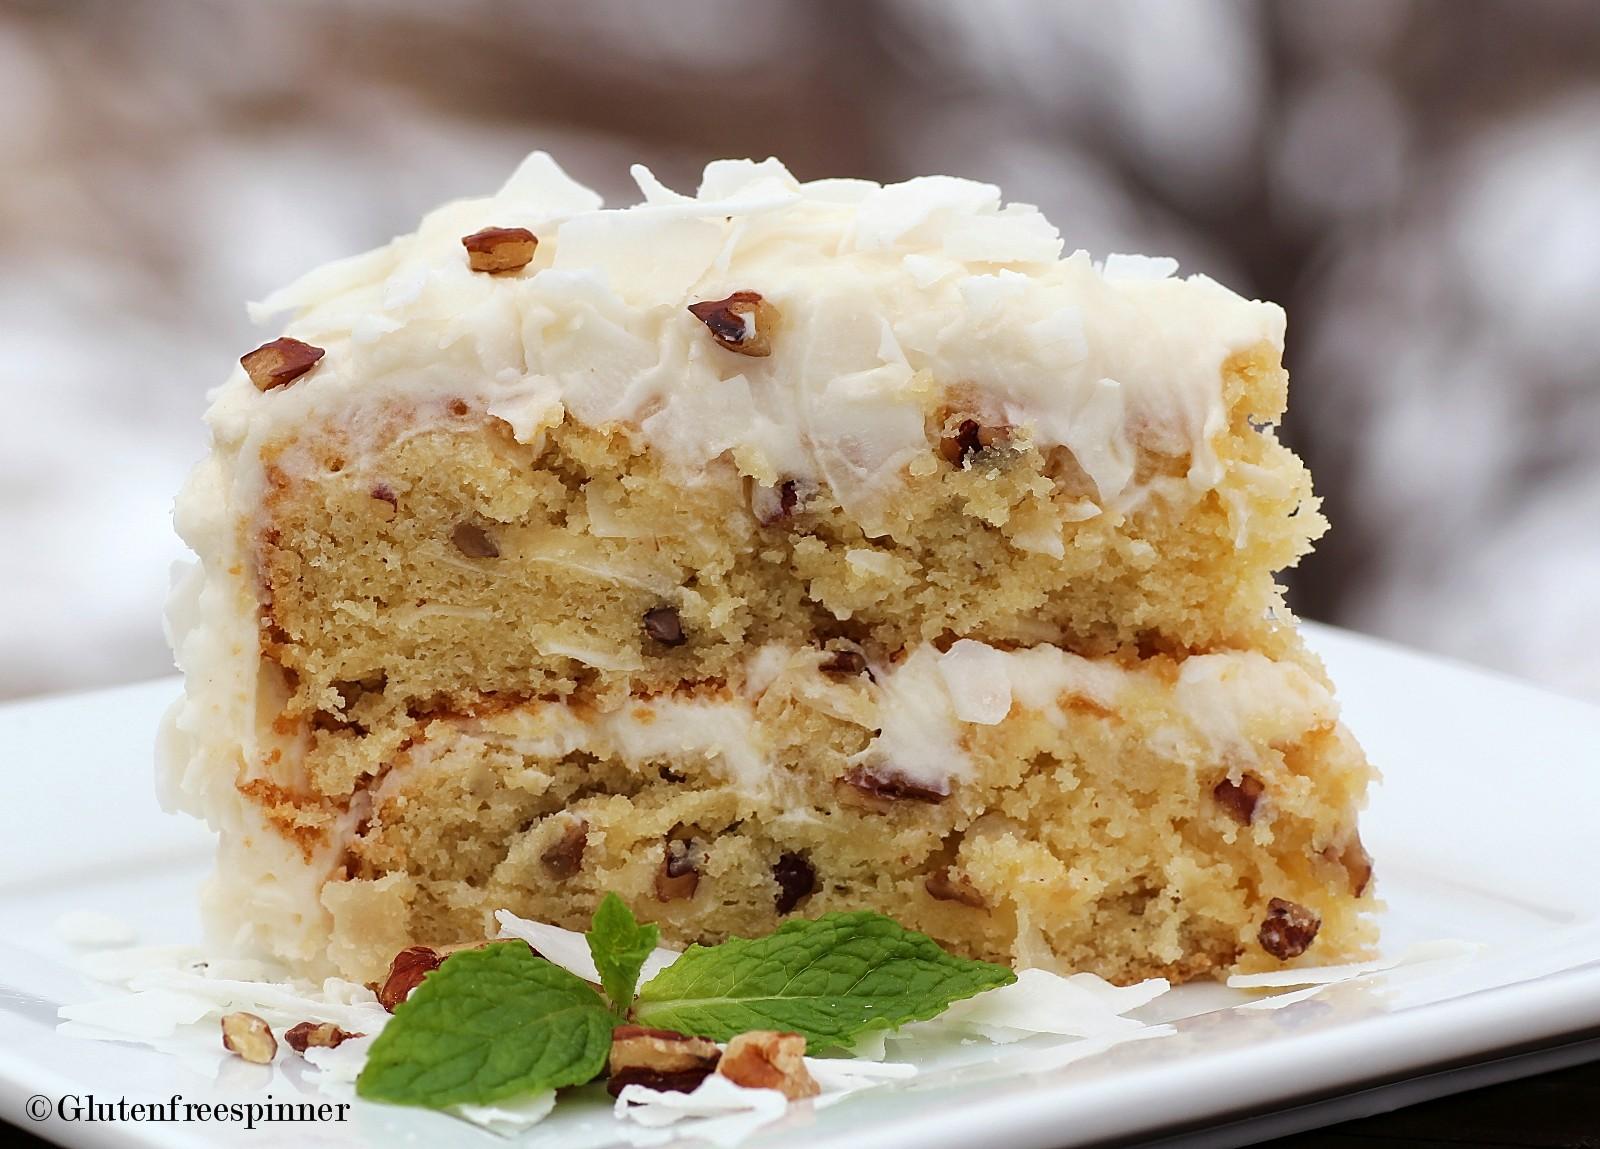 Italian Cake Recipes With Pictures: Italian Wedding Cake